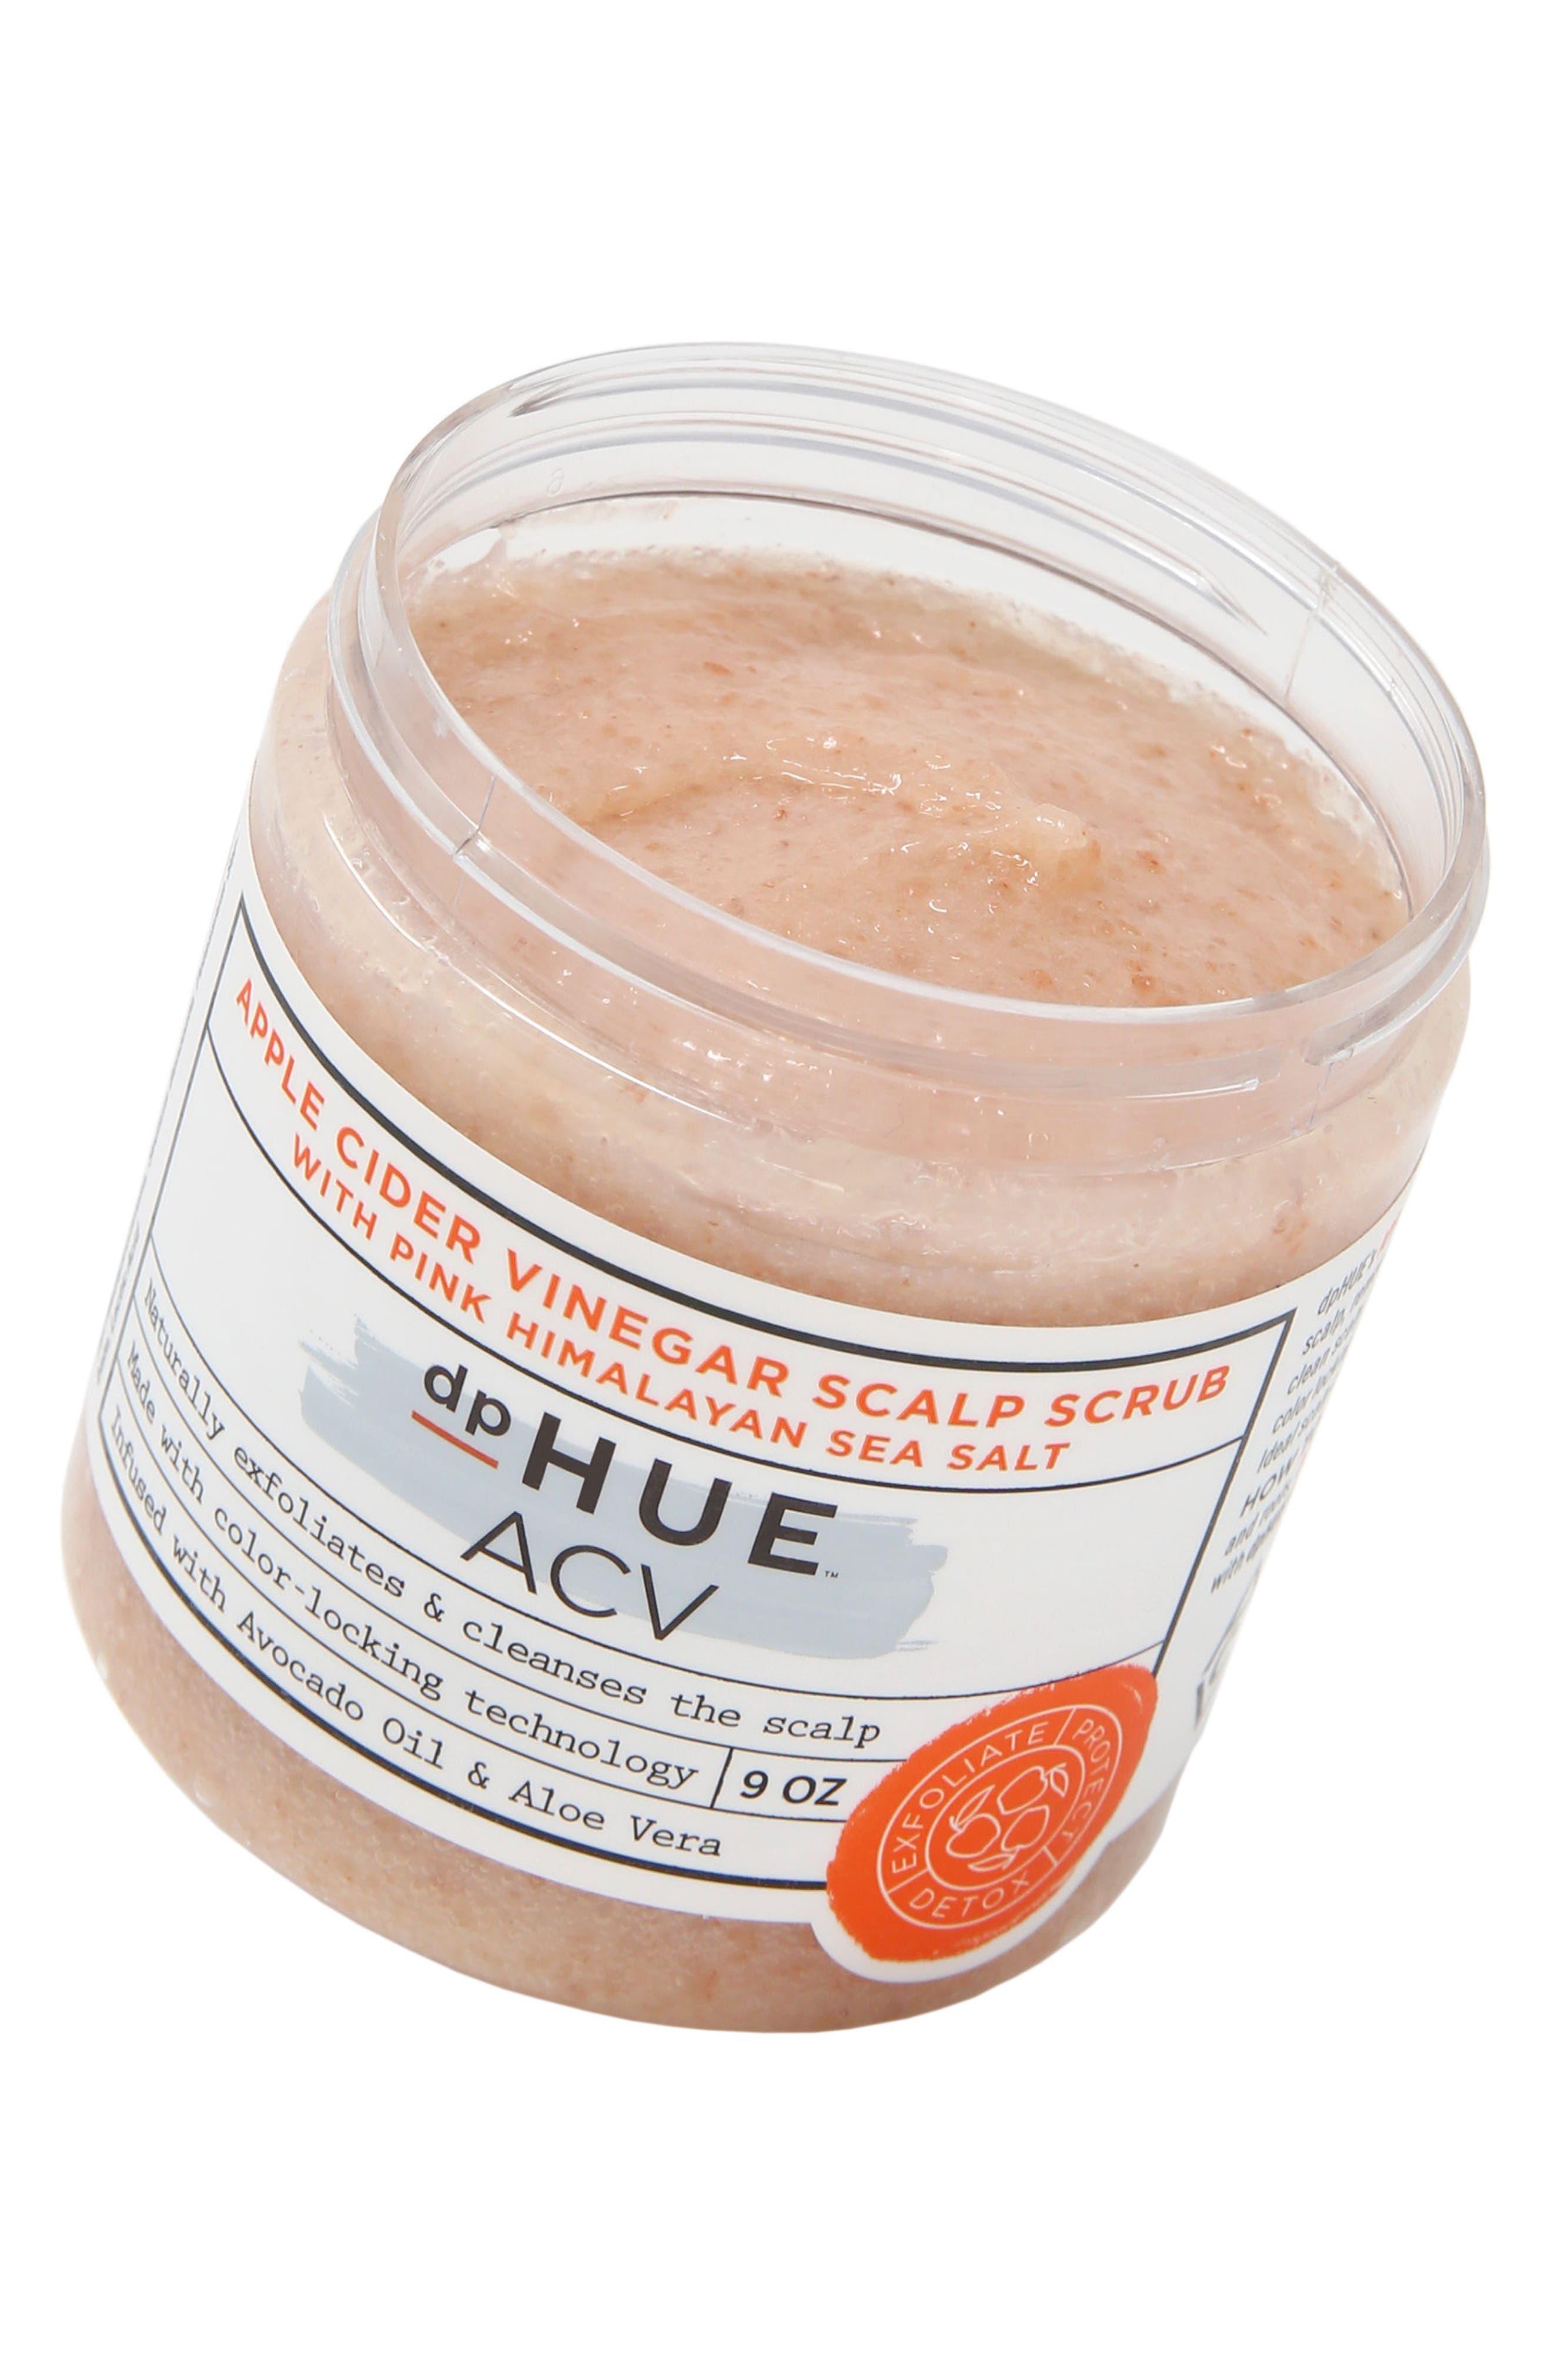 DPHUE, Apple Cider Vinegar Scalp Scrub with Pink Himalayan Salt, Alternate thumbnail 2, color, 000